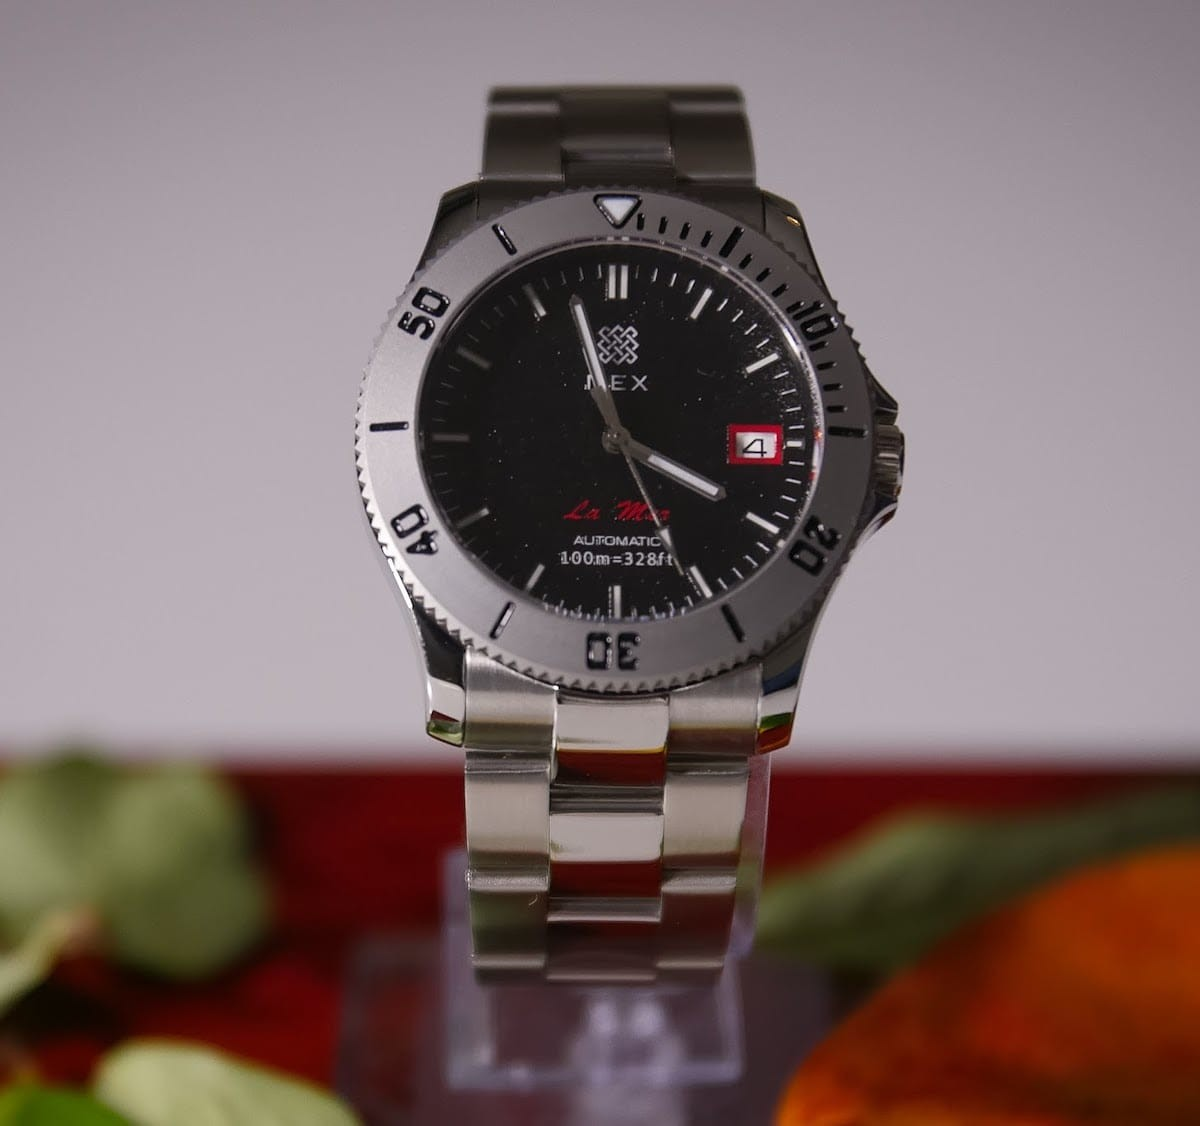 Nex La Mer automatic watch is Norwegian design at its finest